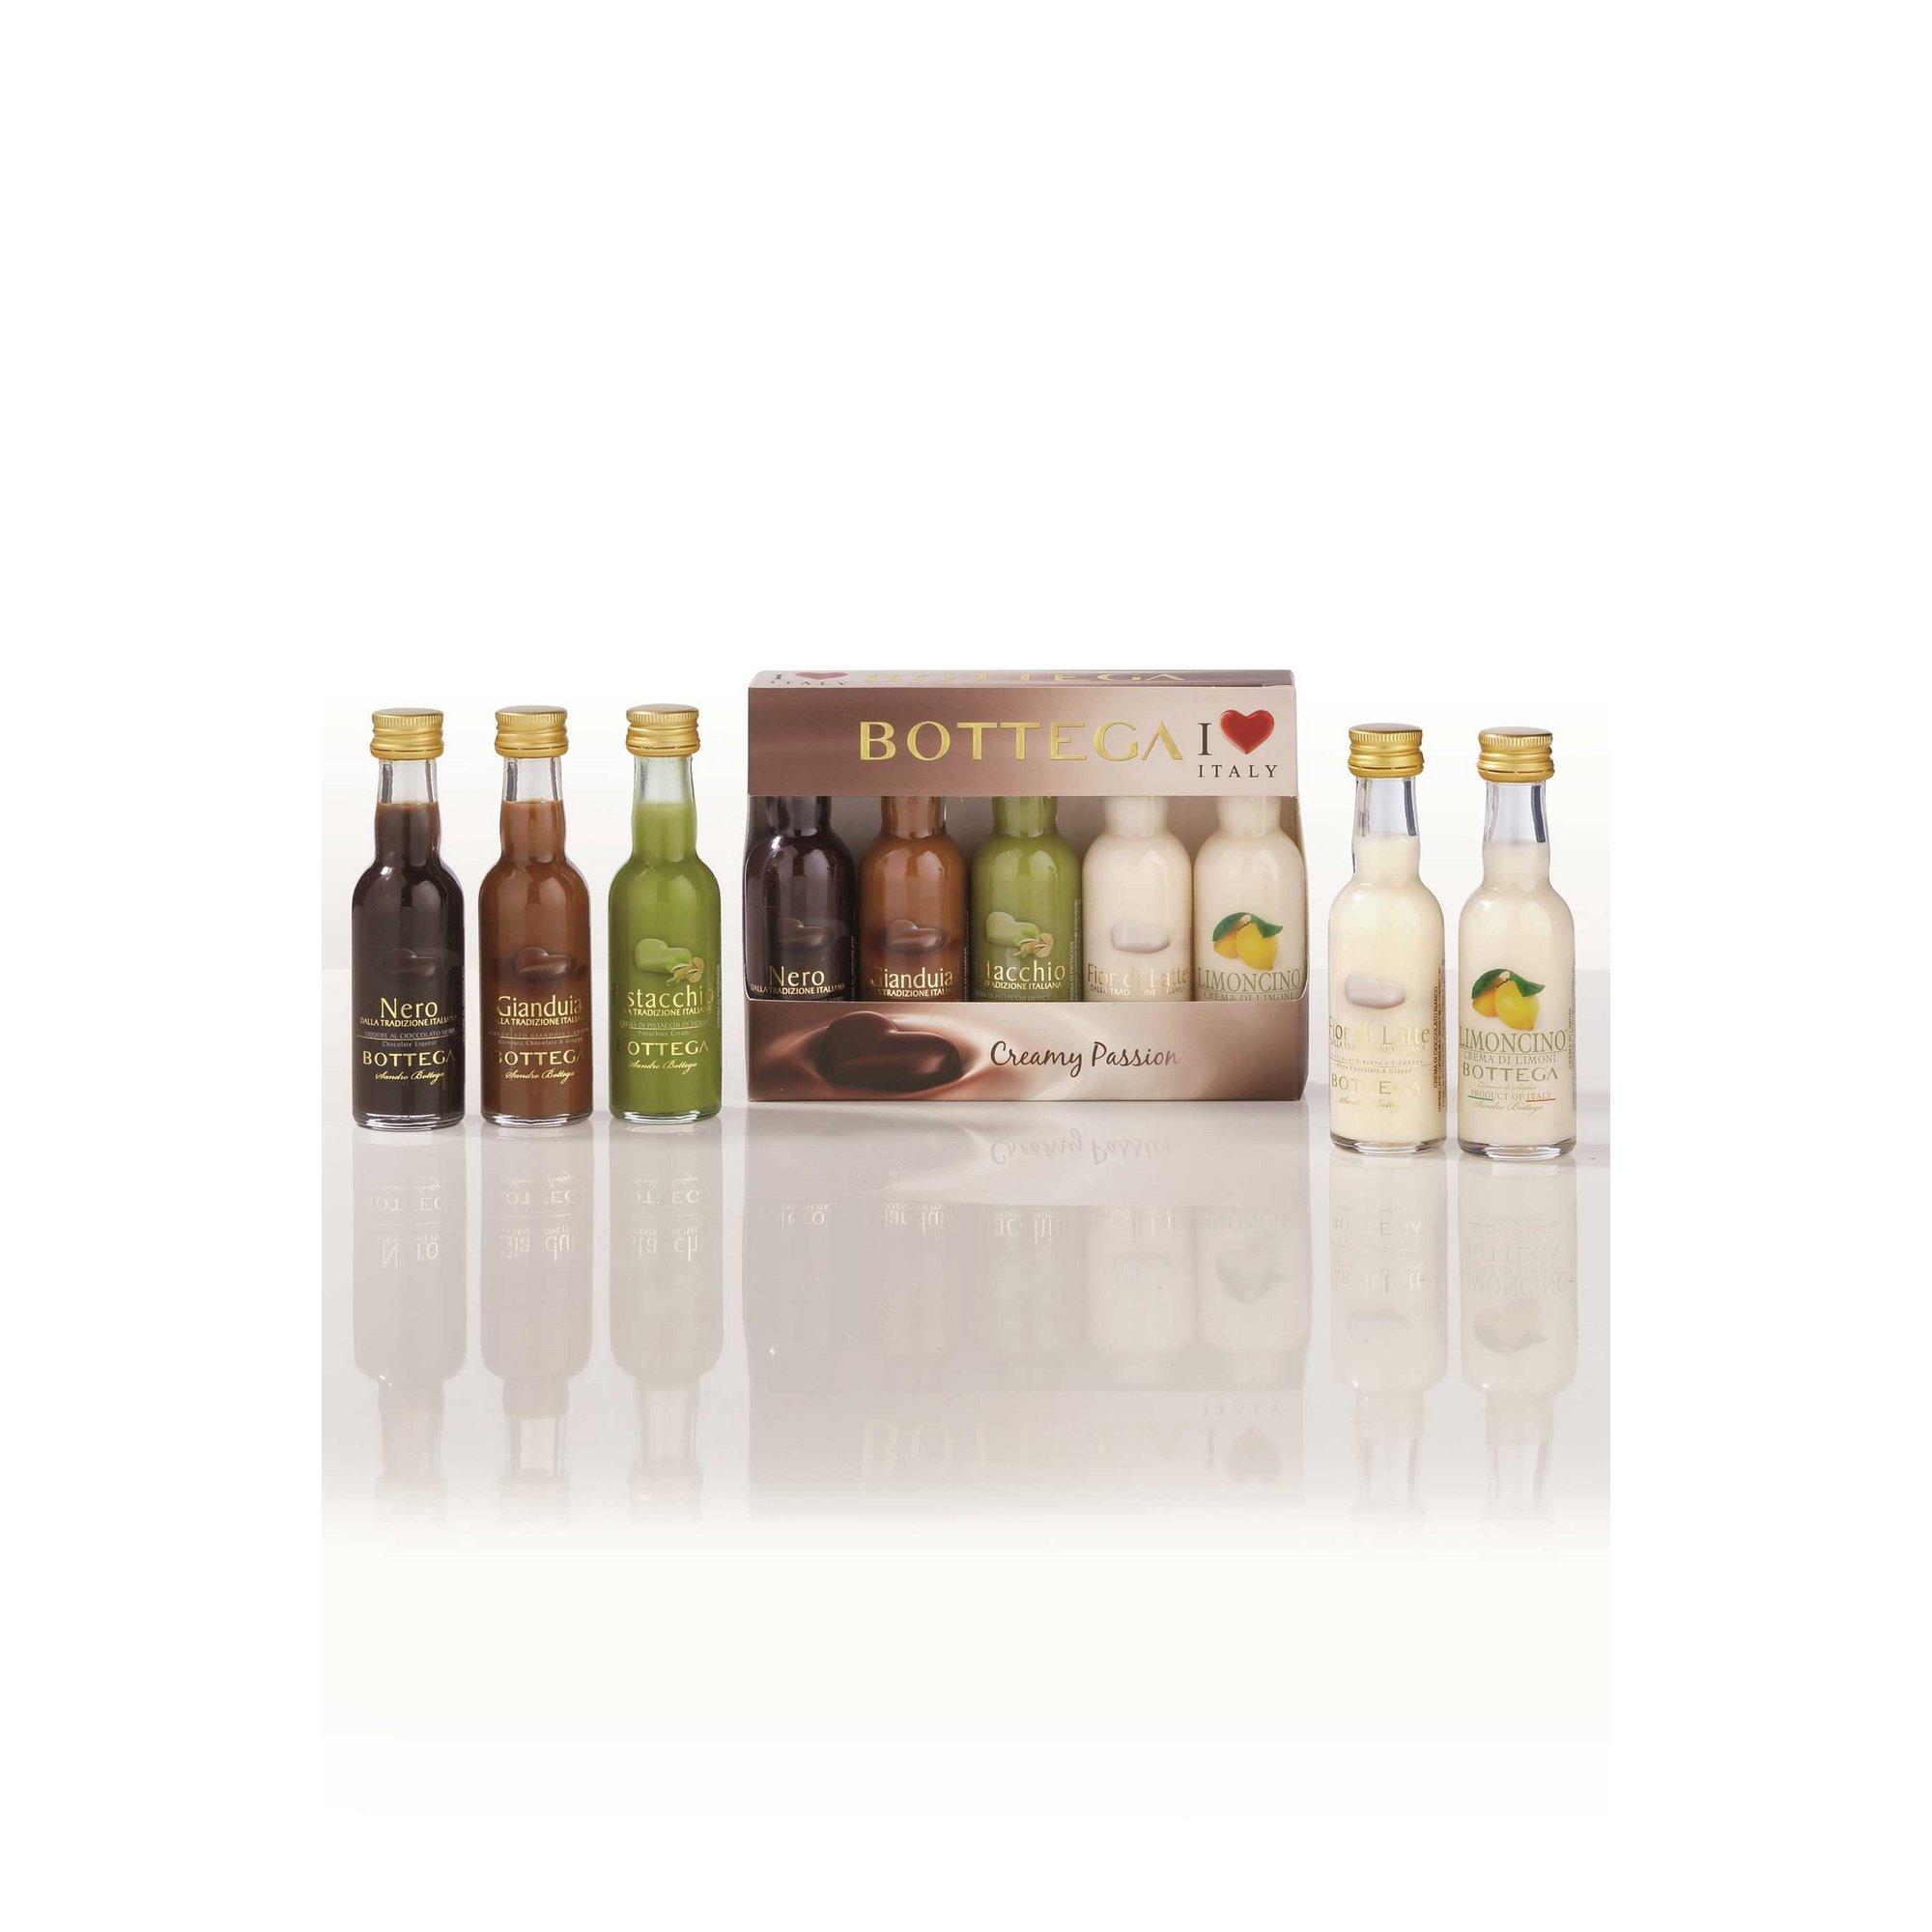 Image of Bottega Creamy Passion Liqueurs Miniature Gift Set